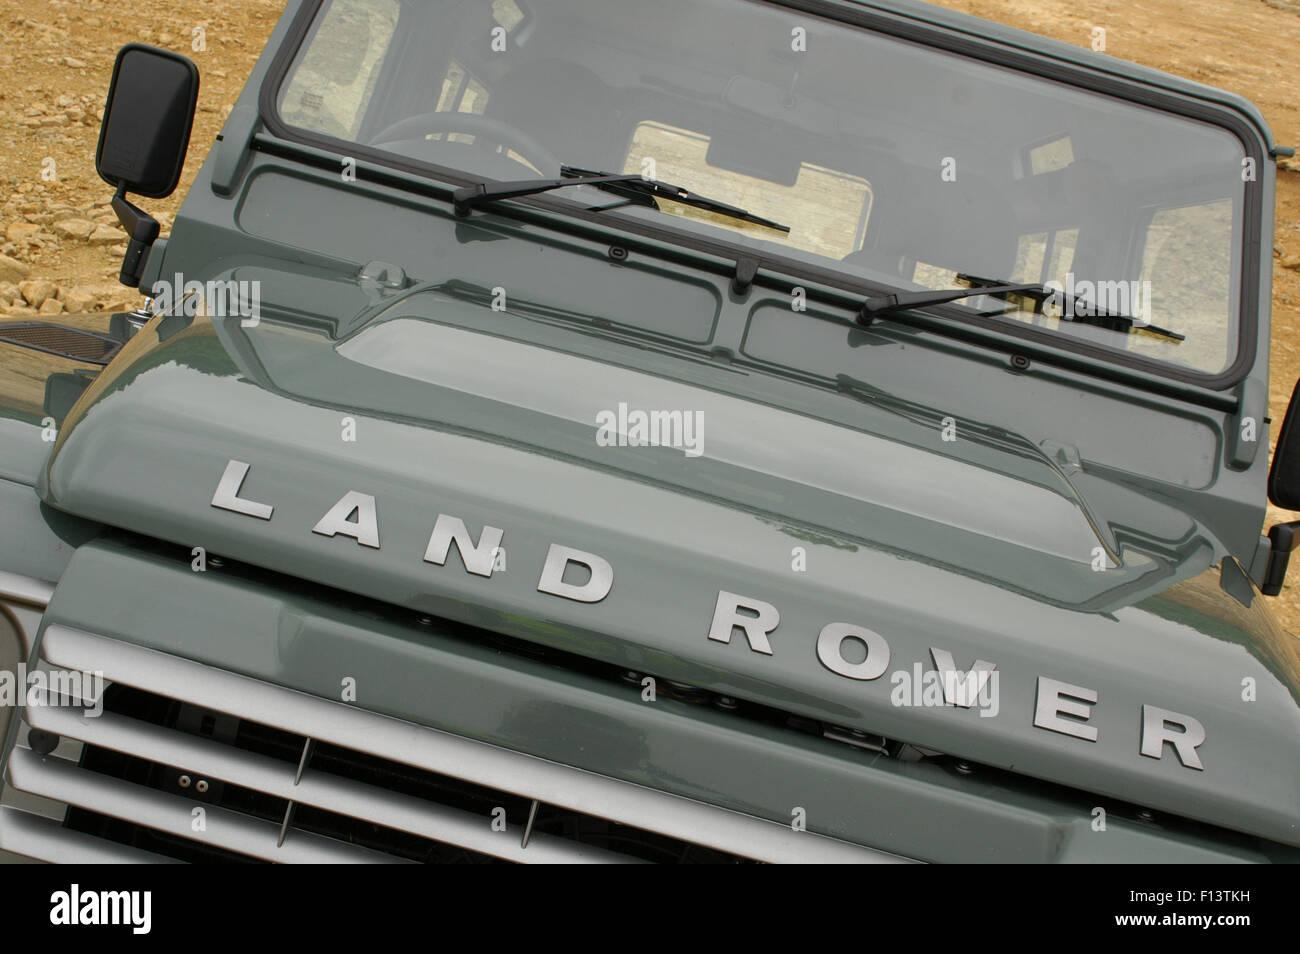 Land Rover Defender 90 XS 2007 model Stock Photo